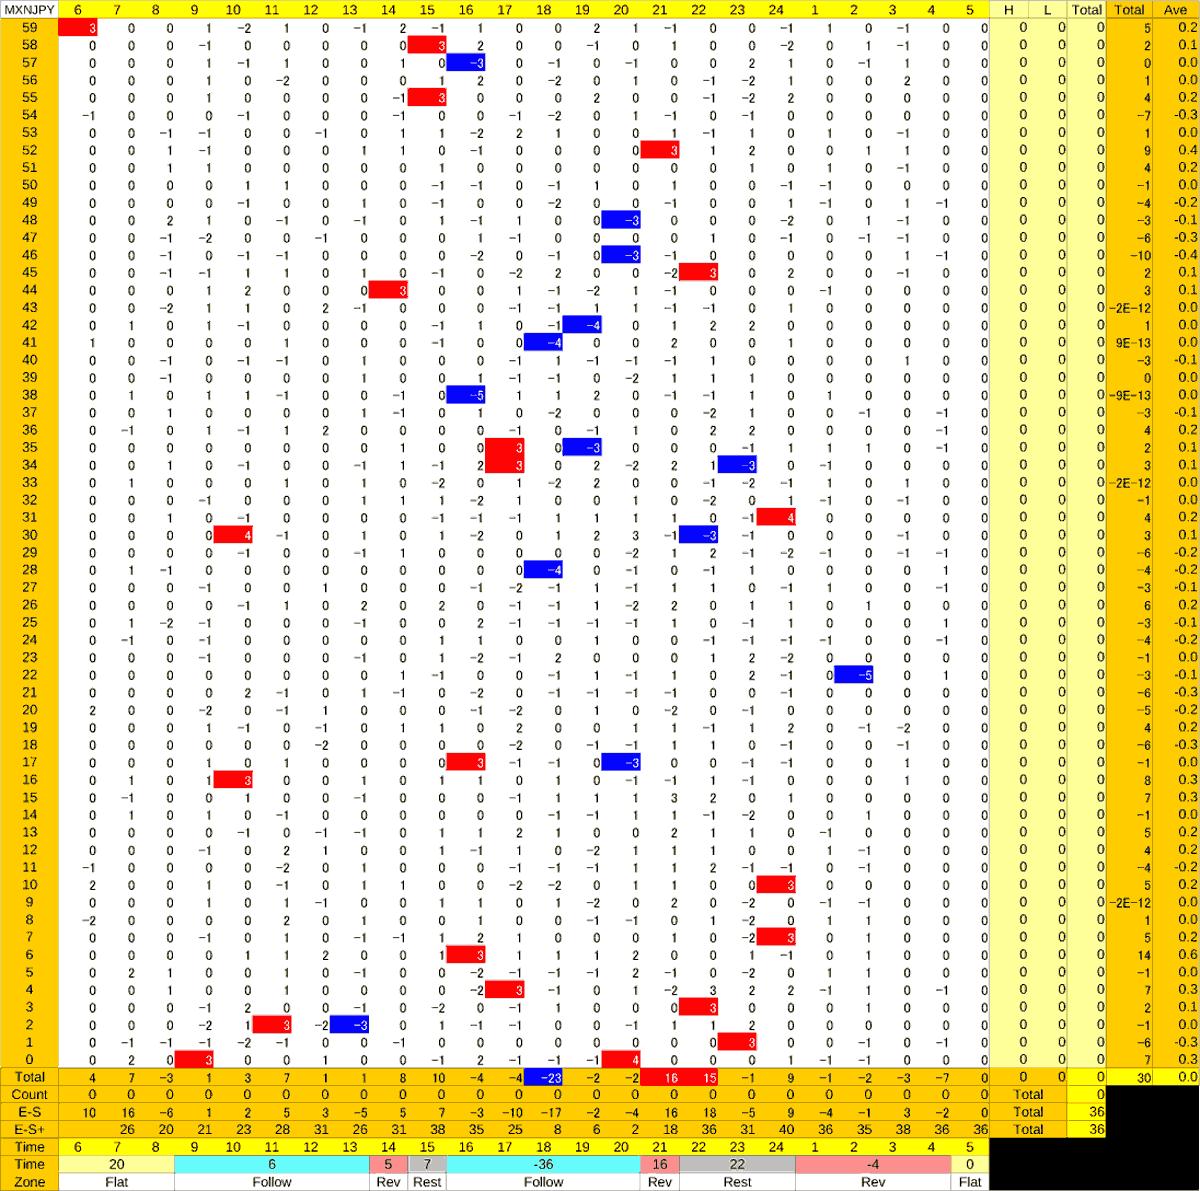 20200703_HS(3)MXNJPY